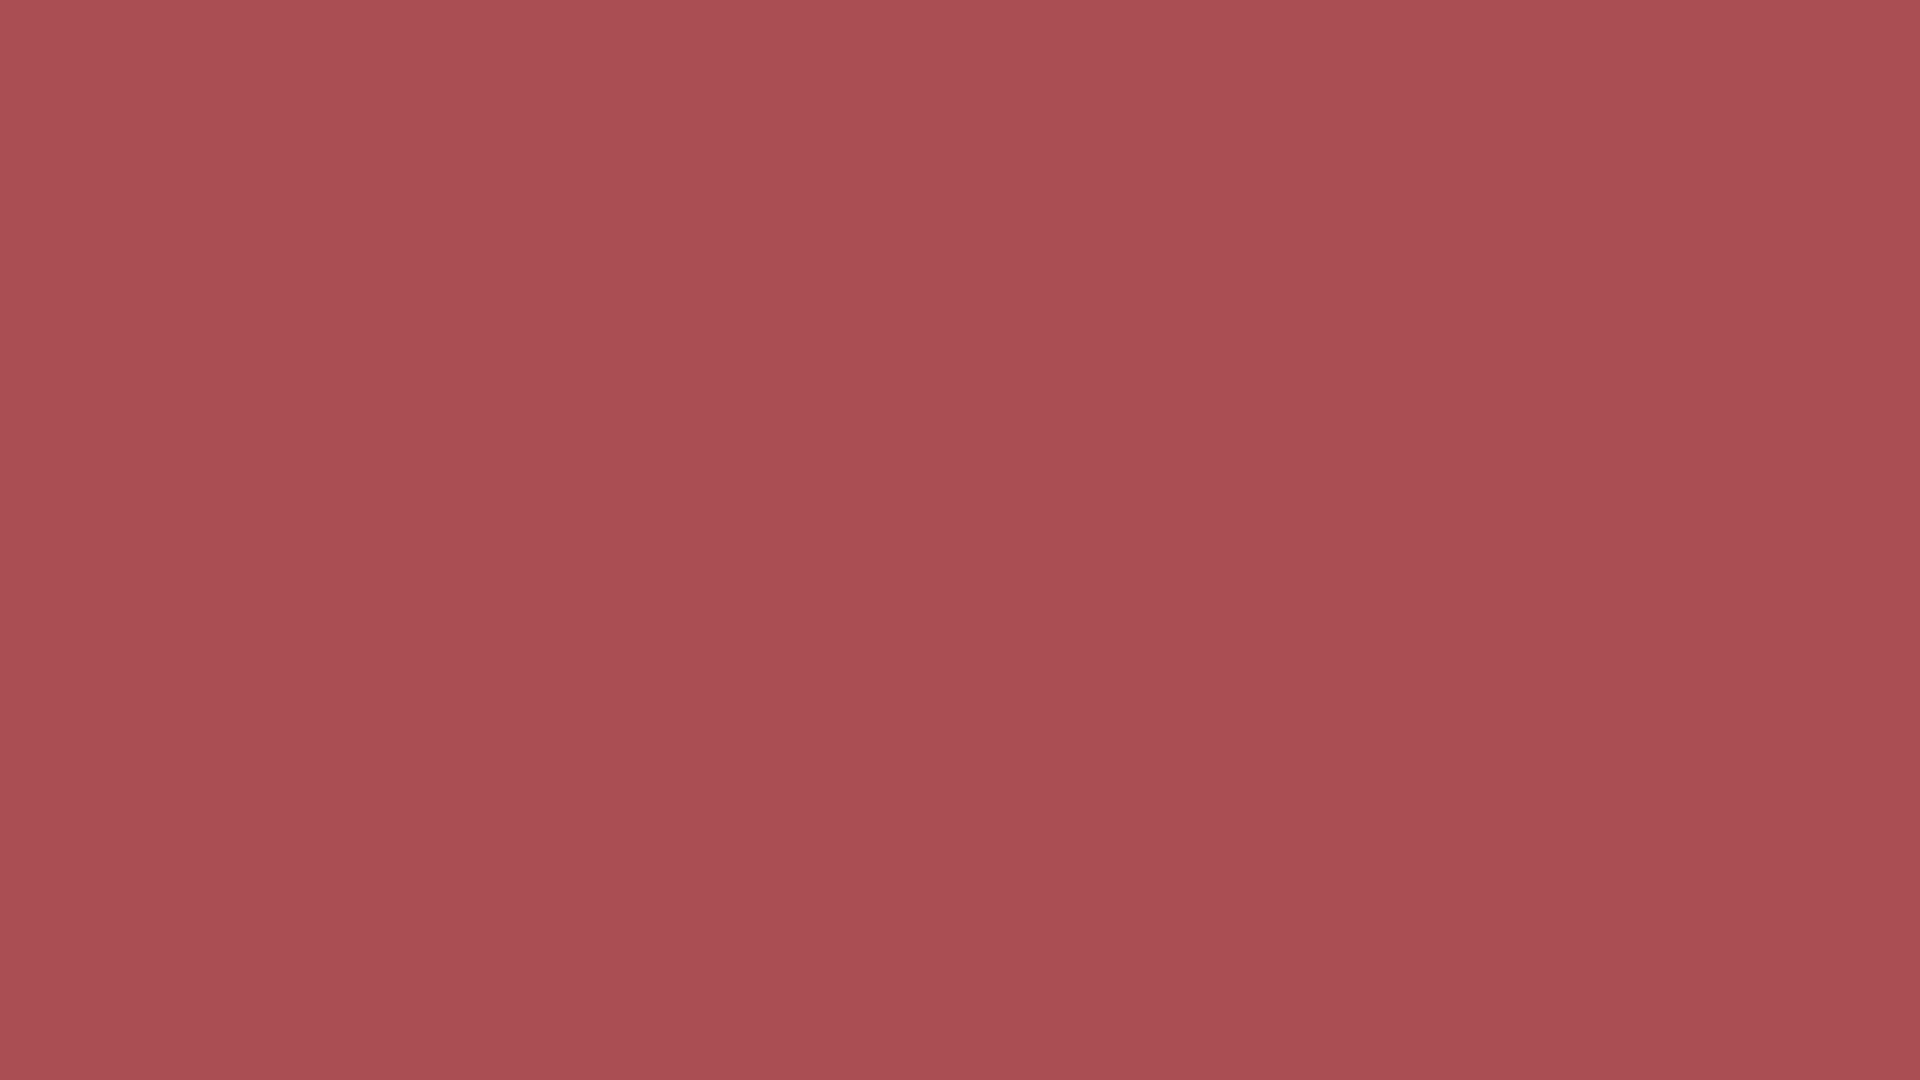 1920x1080 Rose Vale Solid Color Background